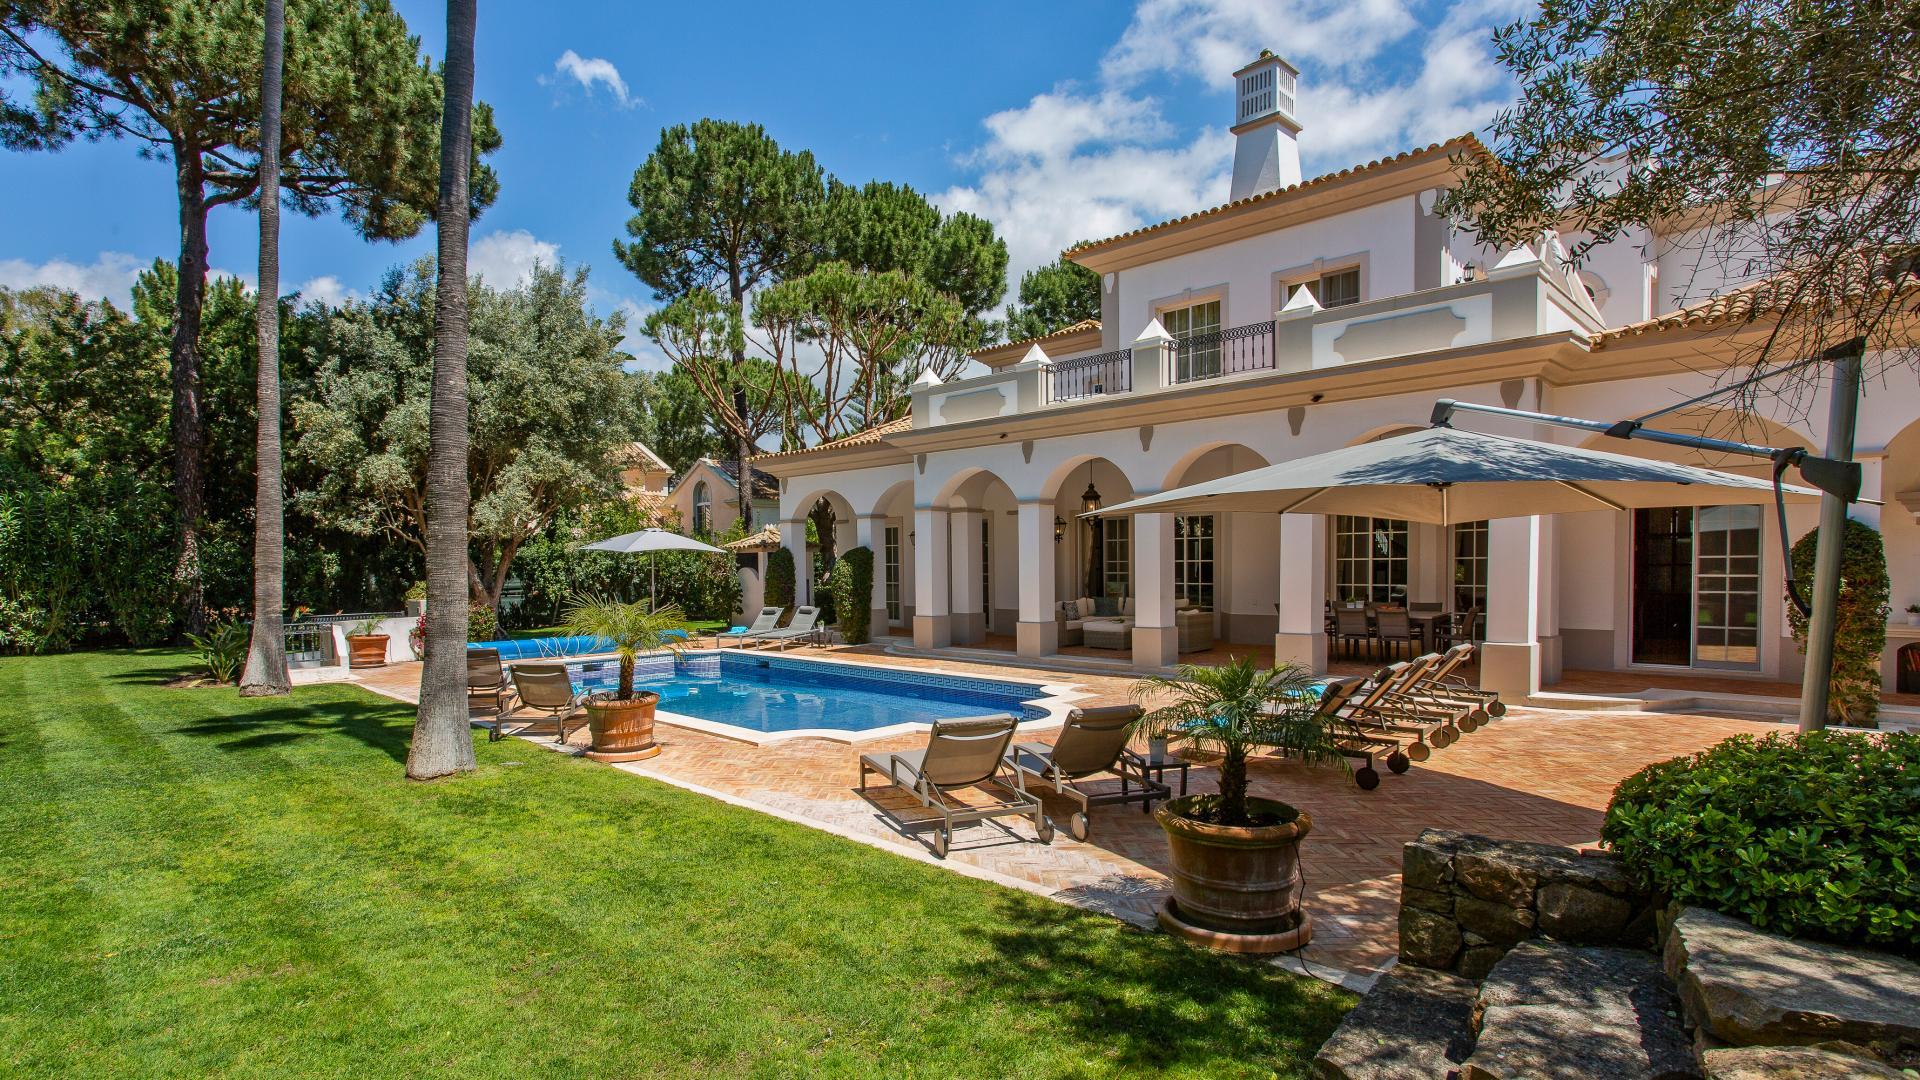 Villa Adilio - Pinheiros Altos, Quinta do Lago, Algarve - 1.png